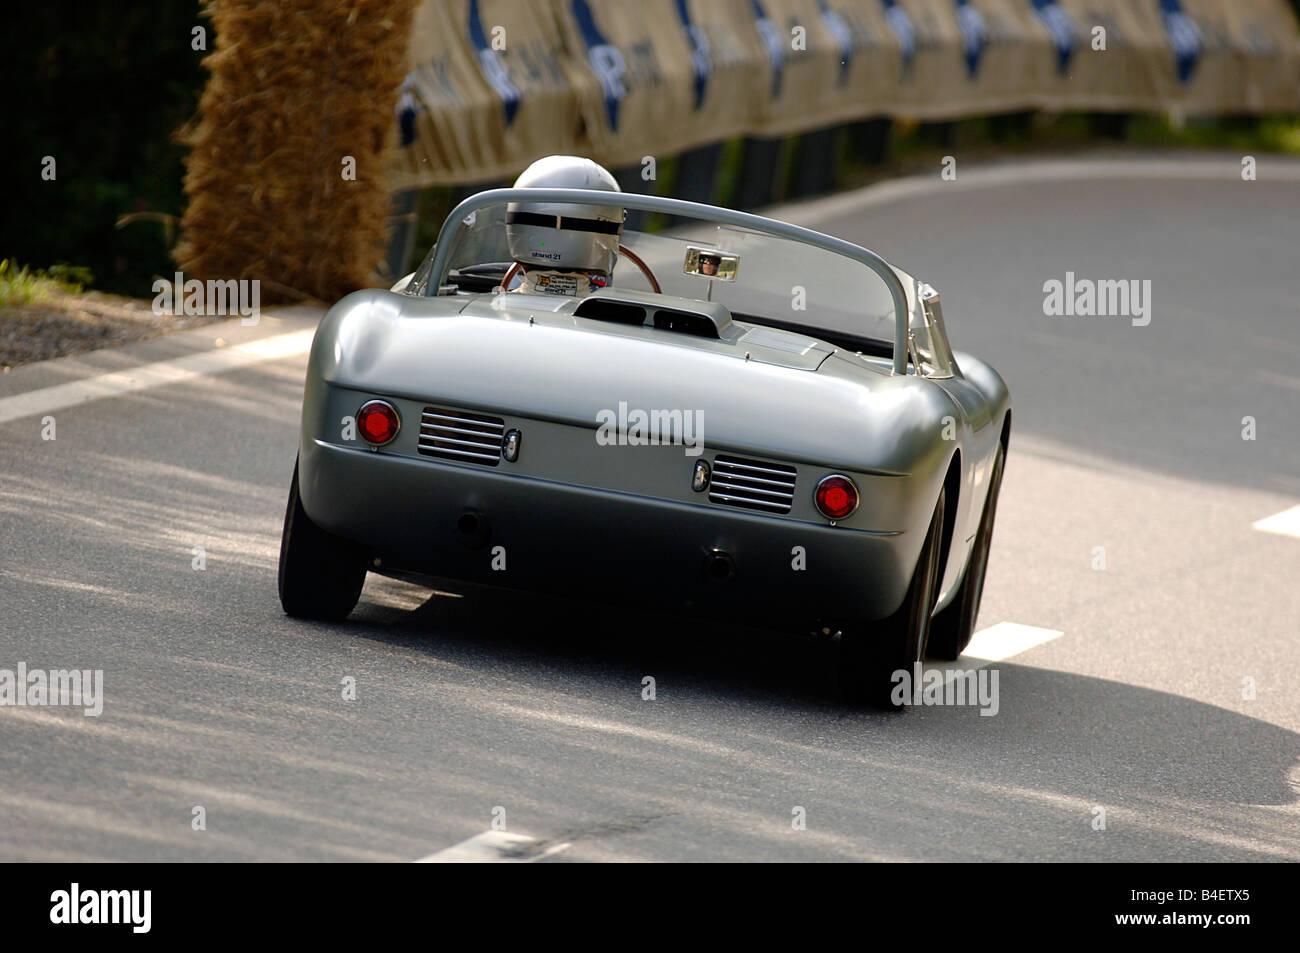 Car, BMW 700 RS, Sports Car, Racing Car, Vintage Car, Model Year Approx.  1960, 1960s, Sixties , Driving, Diagonal Back, Back Vie